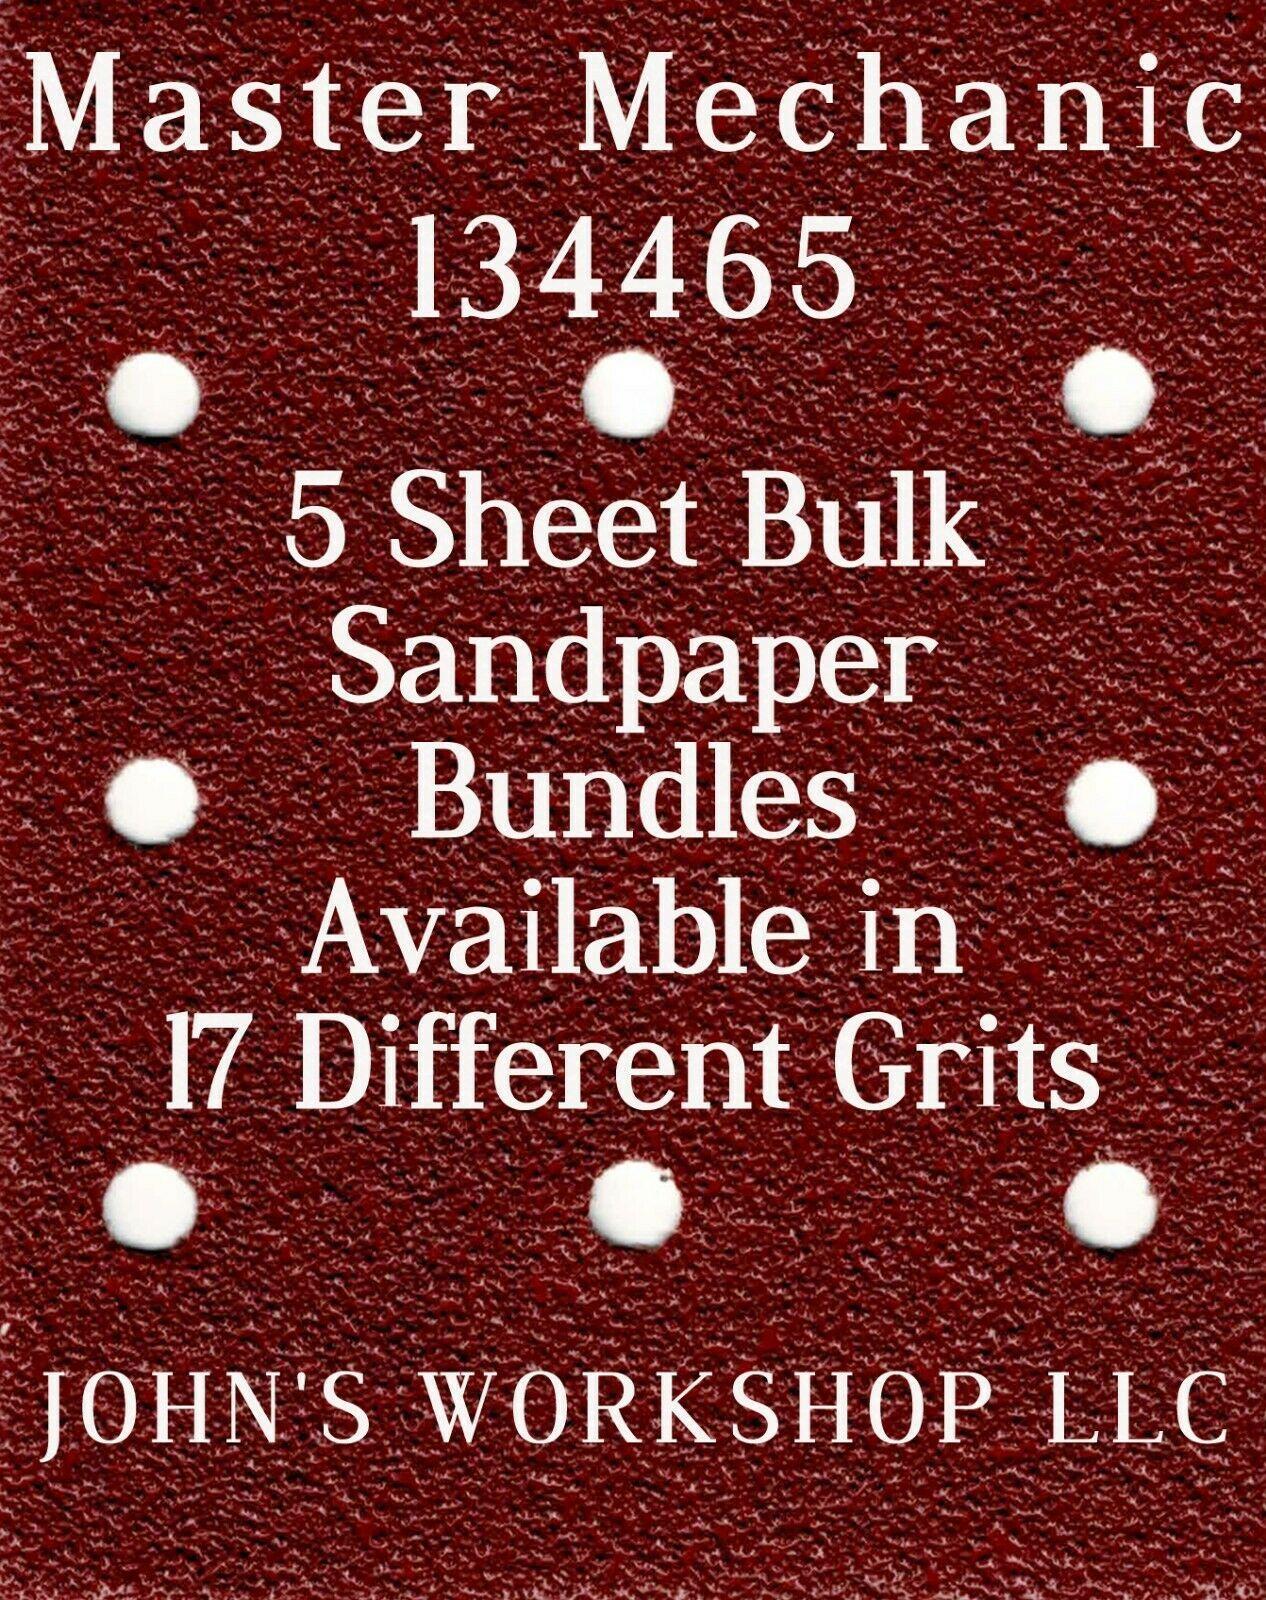 Master Mechanic 134465 - 1/4 Sheet - 17 Grits - No-Slip - 5 Sandpaper Bulk Bdls - $7.14